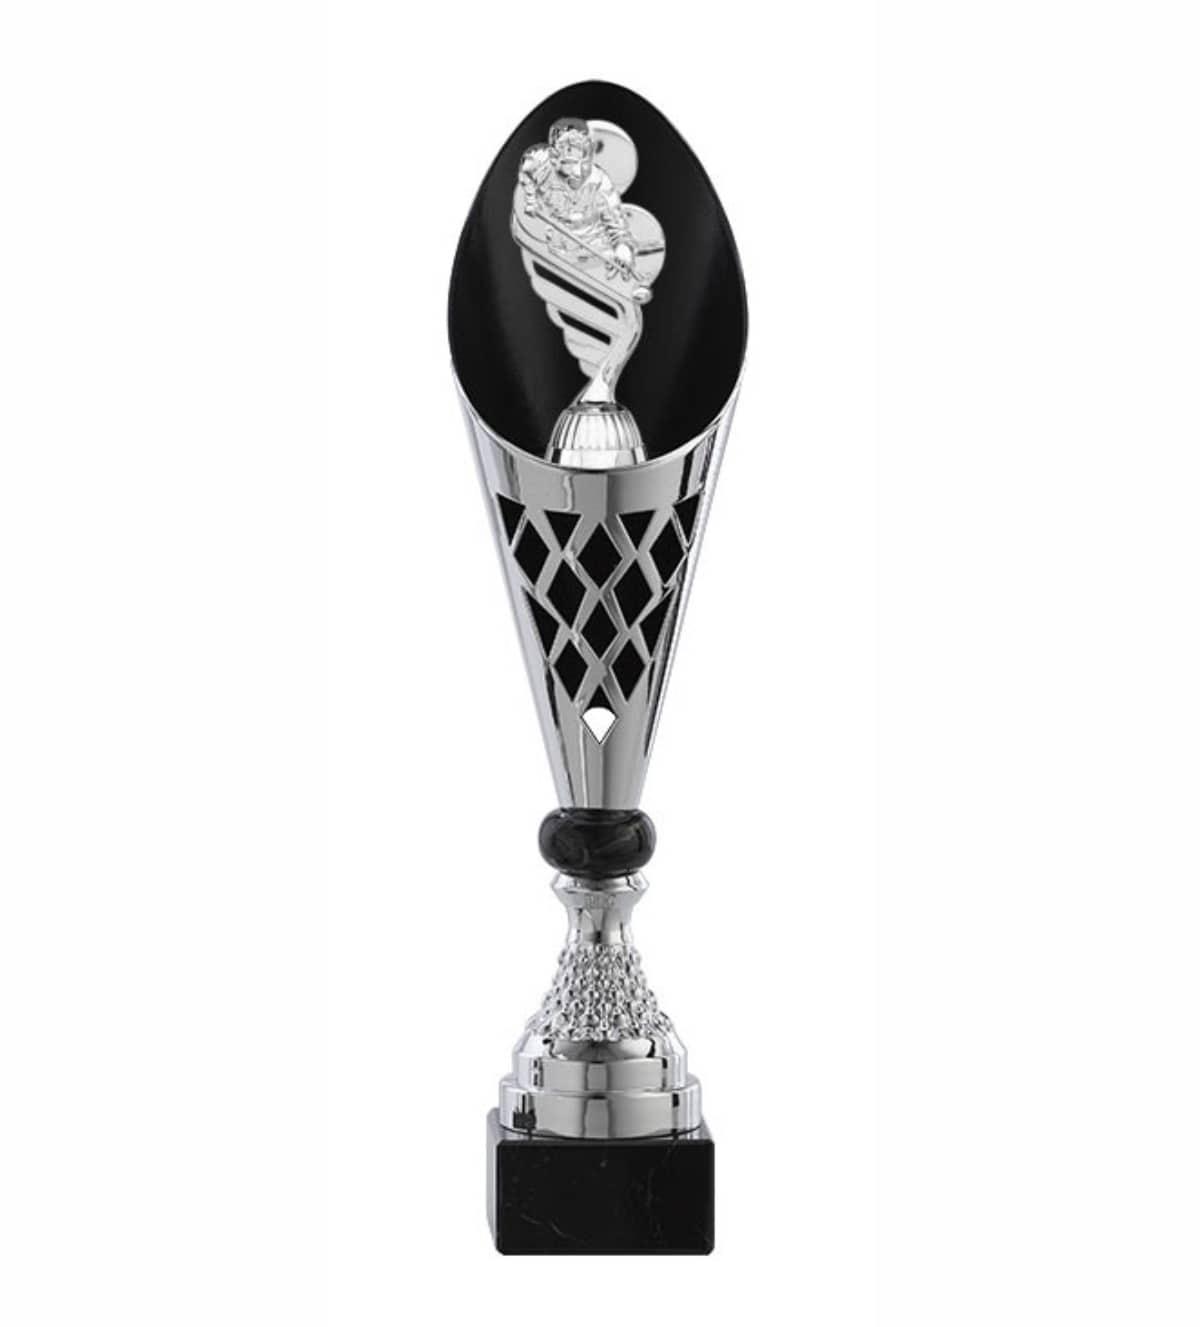 grote biljart trofee